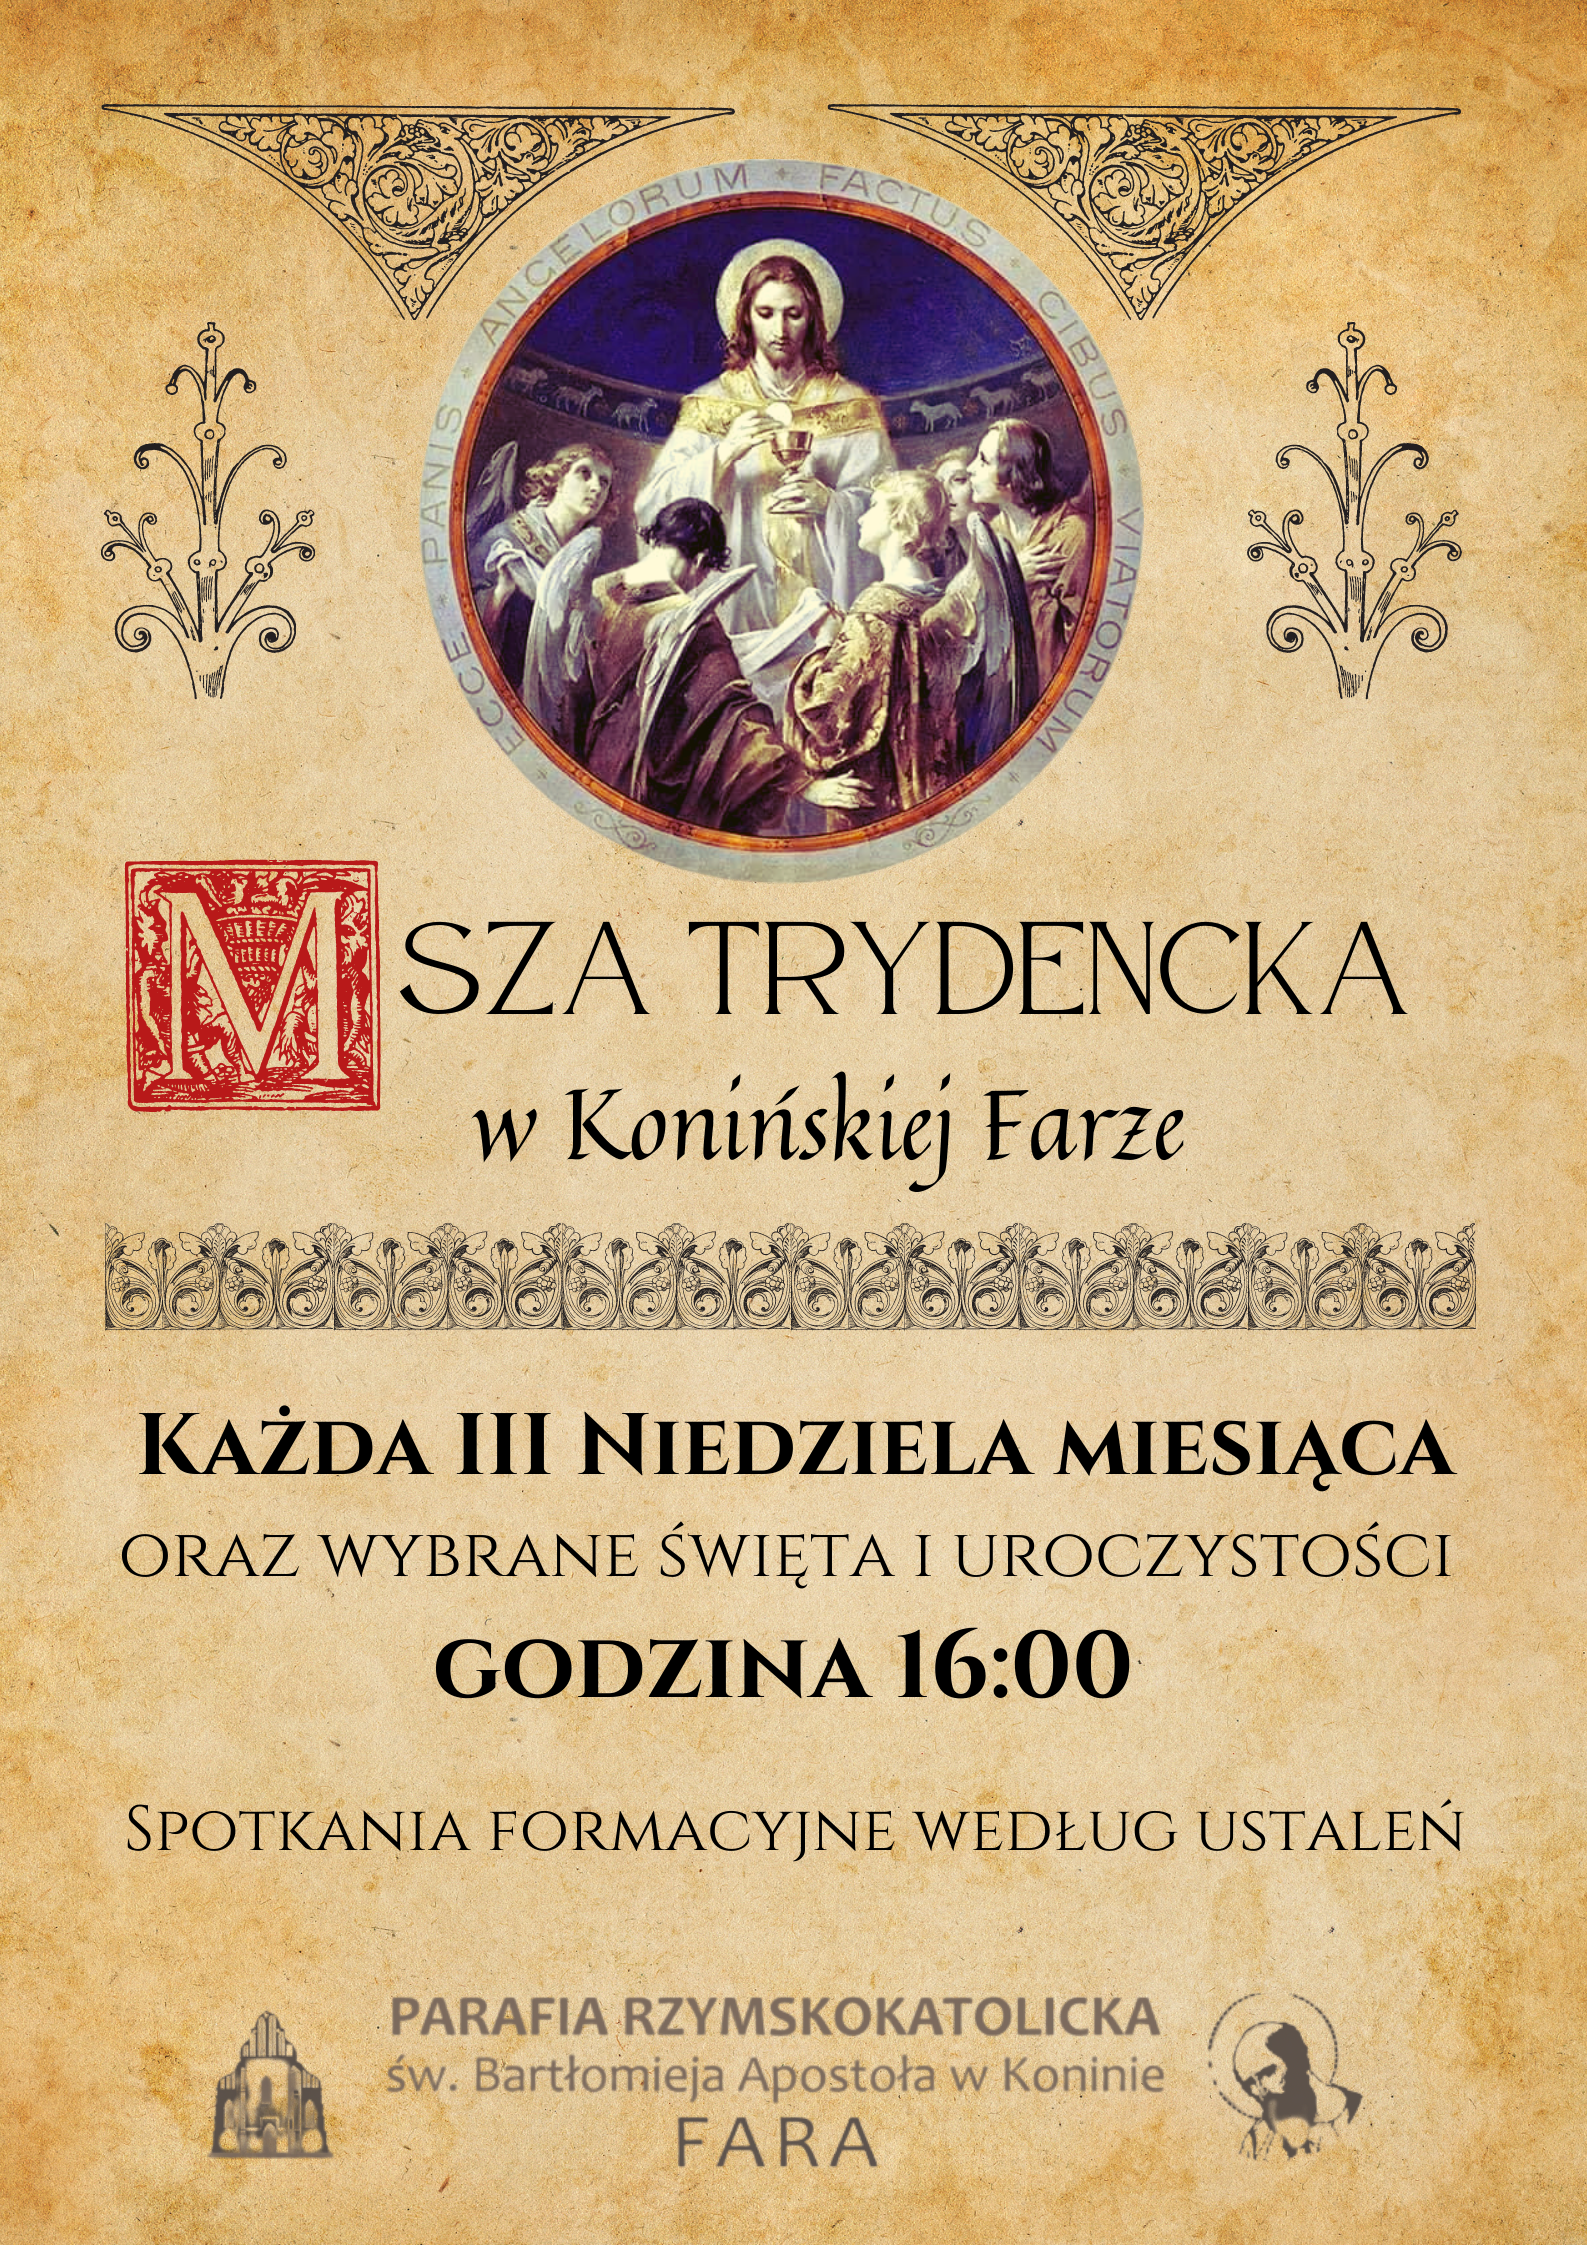 Msza Trydencka